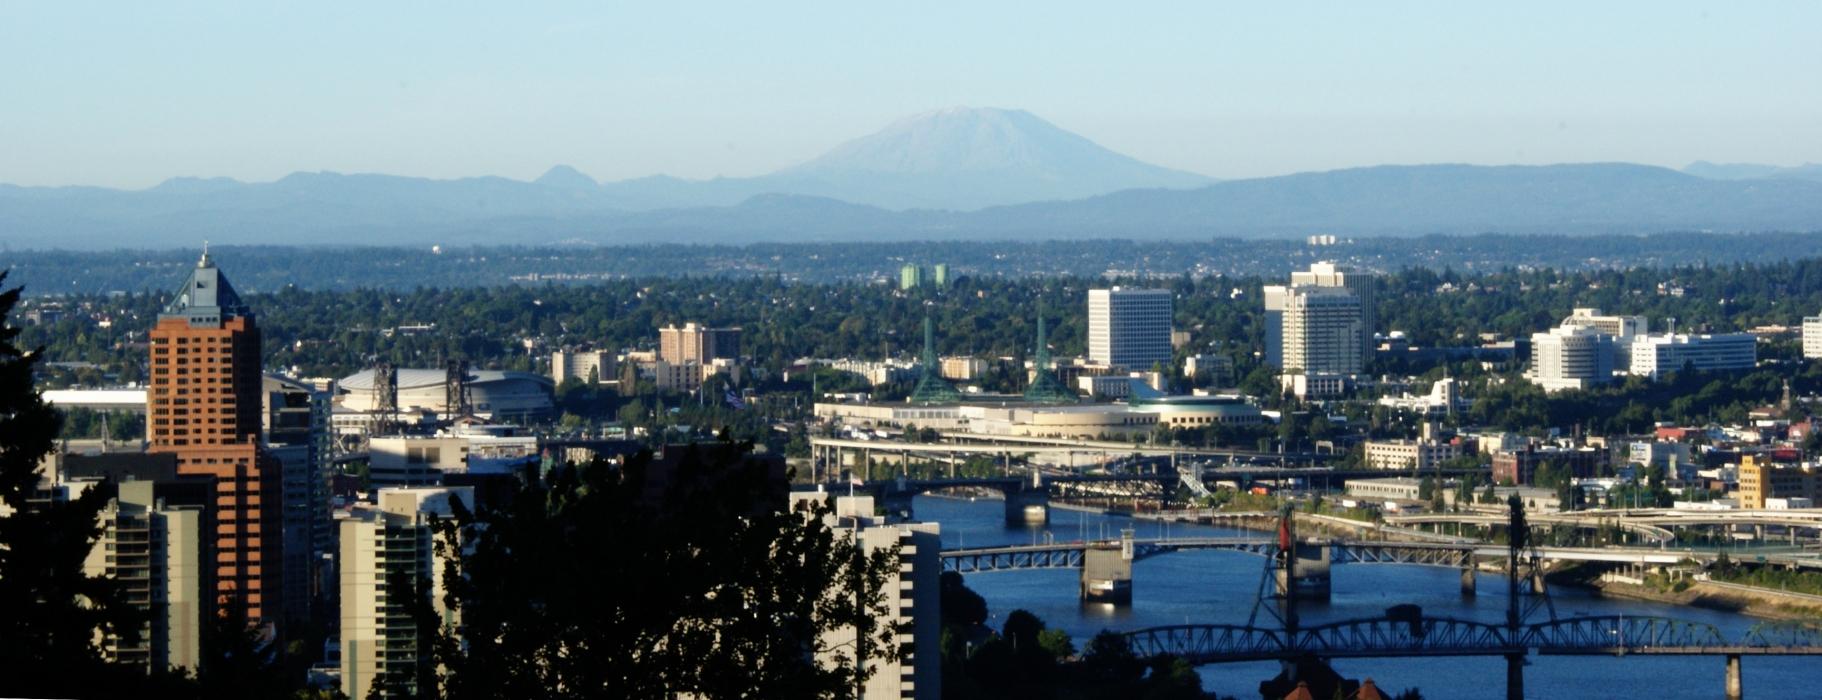 10 Best Scenic Overlooks In Portland